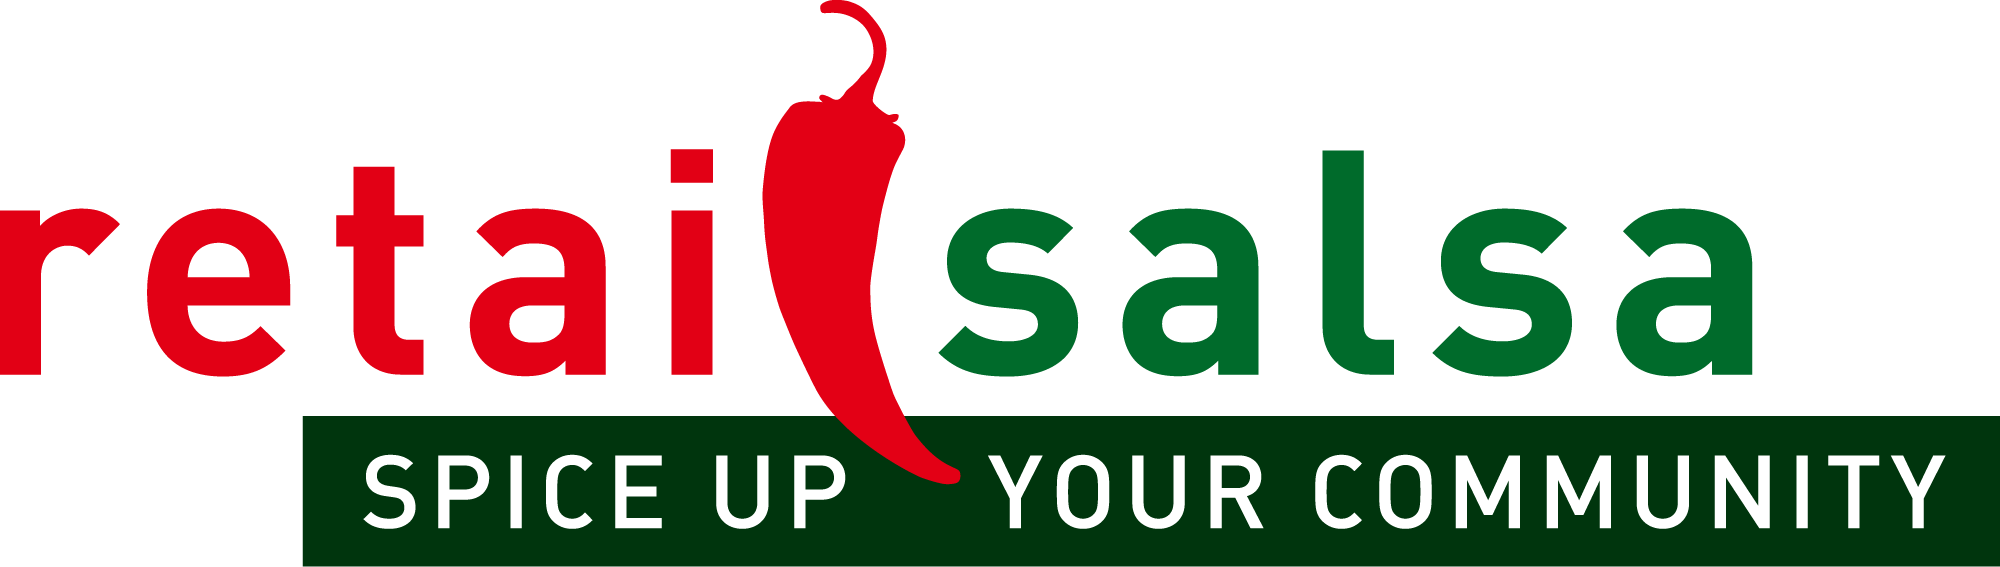 Retail Salsa